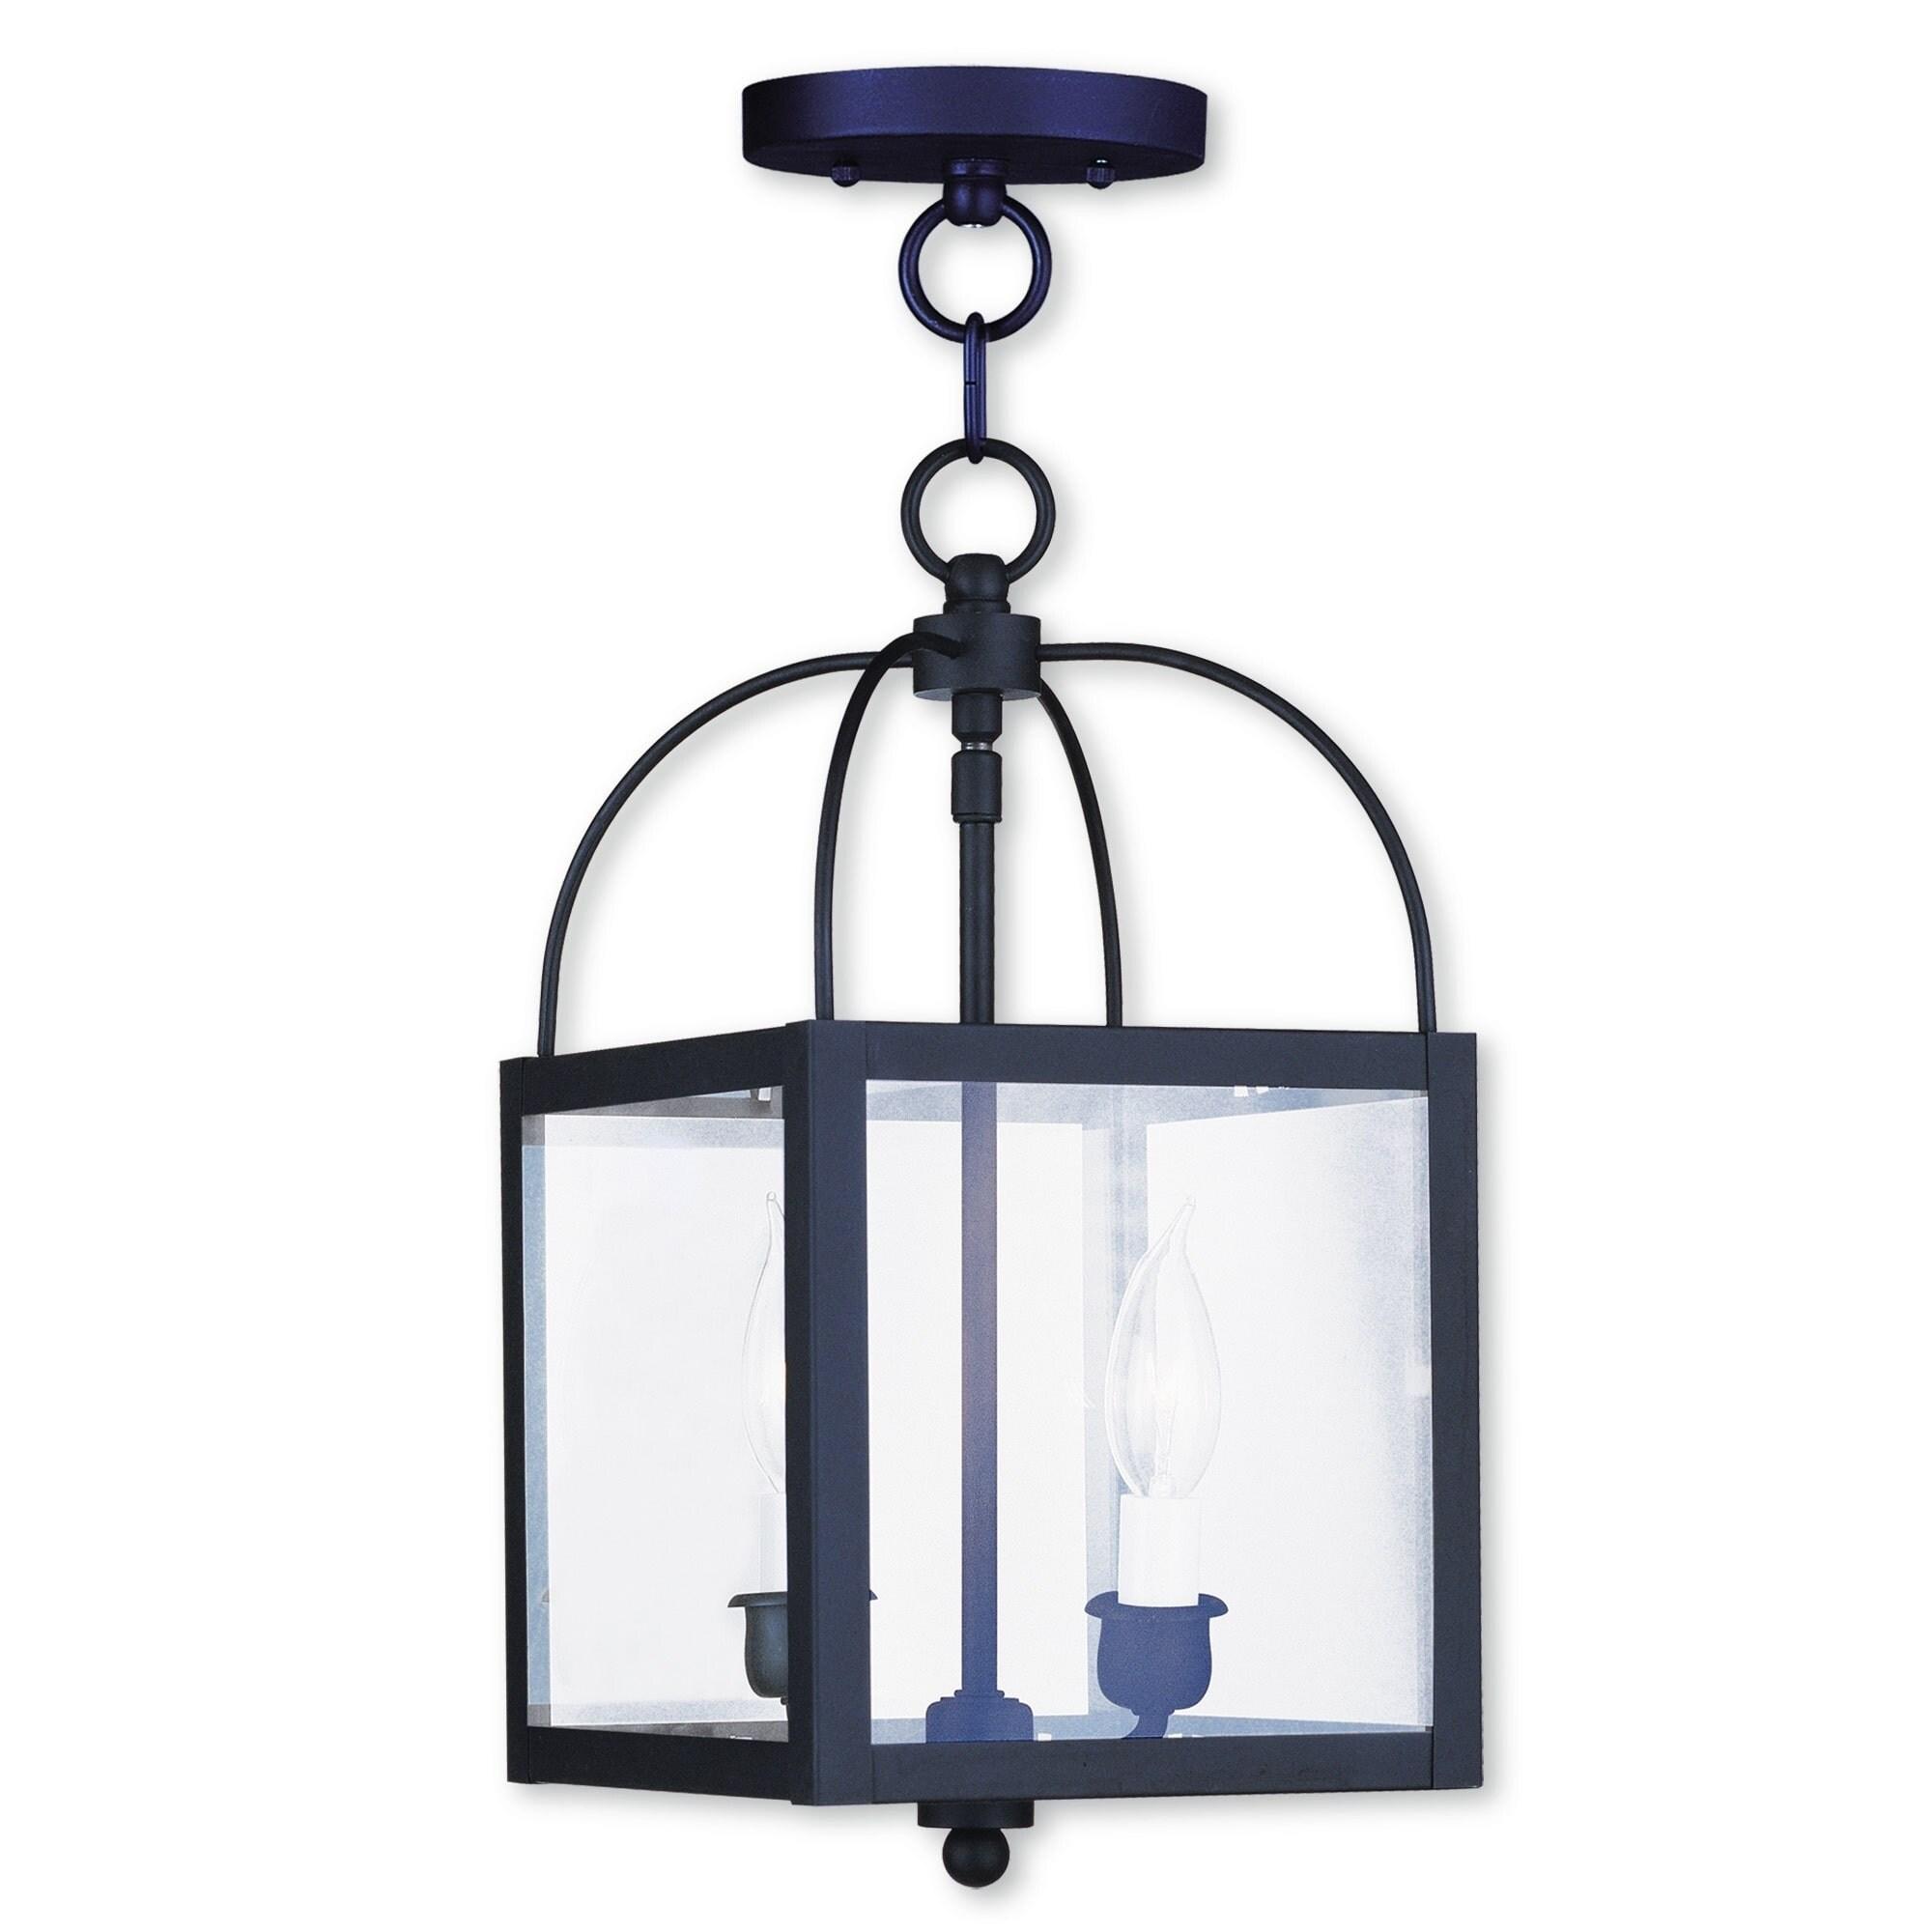 Livex Lighting Milford Black 2-light Convertible Chain Hang/Ceiling Mount (Black)